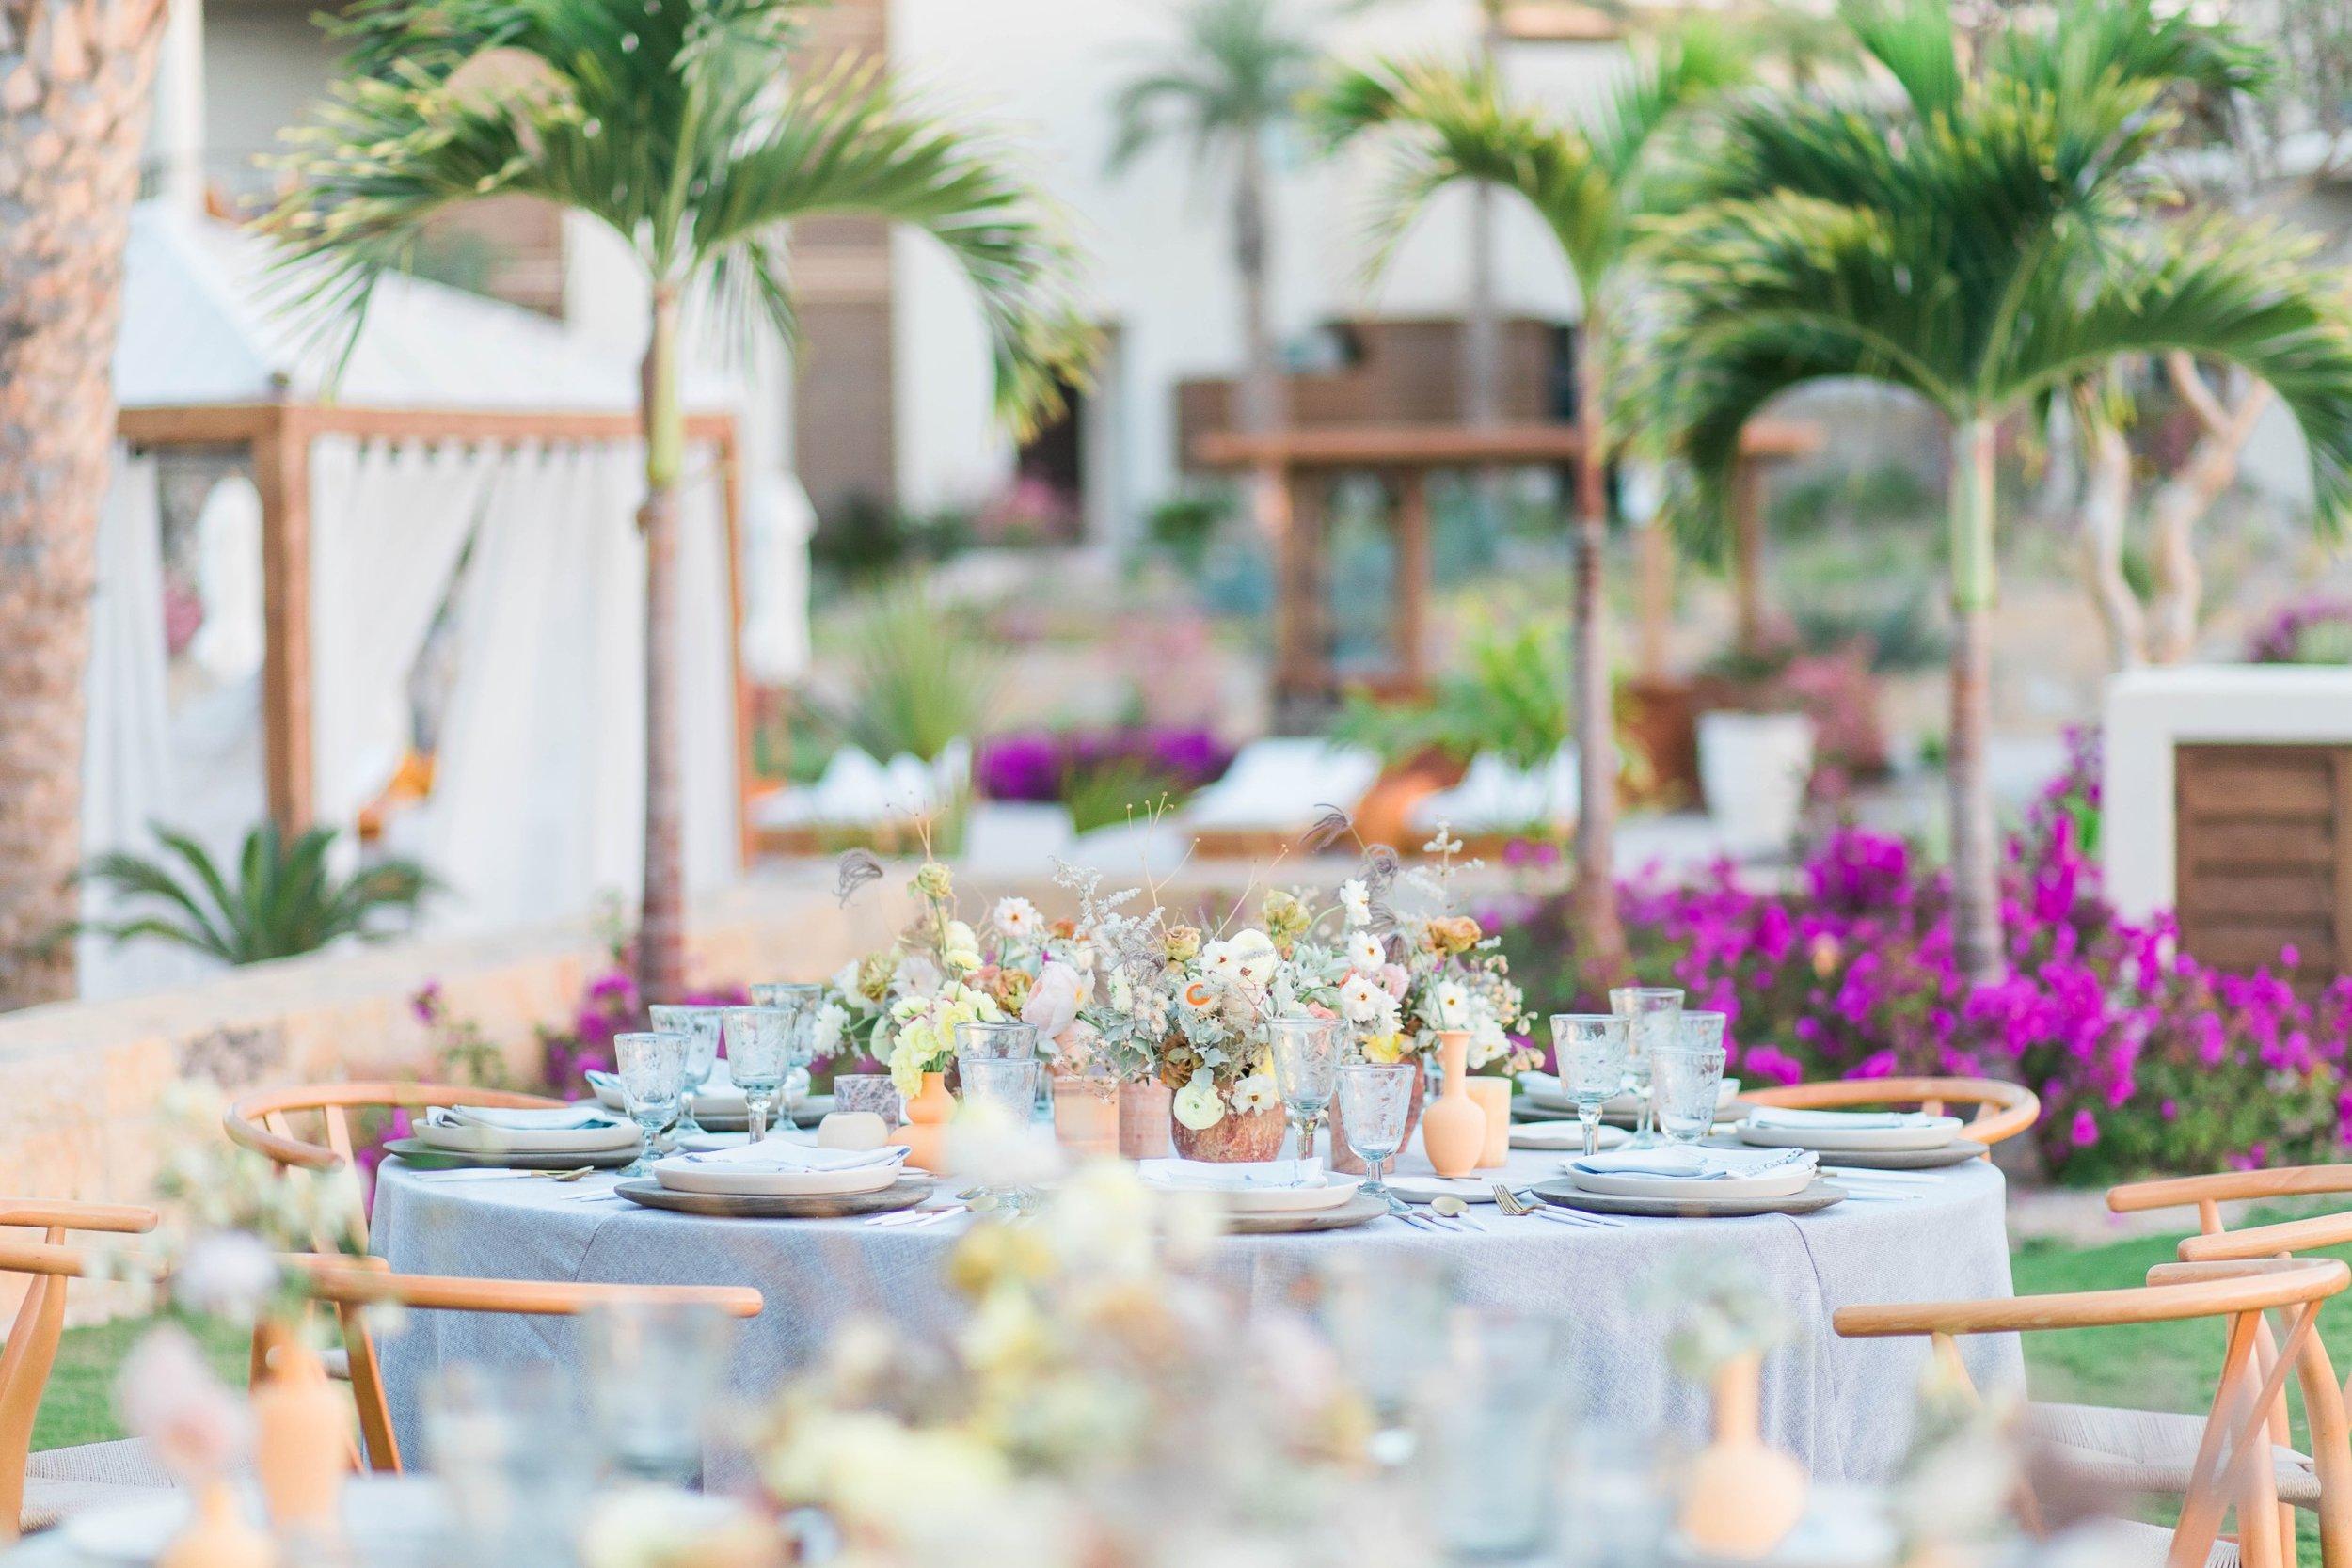 Los Cabos Wedding Photographer - Destination Wedding - Chileno Bay Resort Wedding Photos (23).jpg